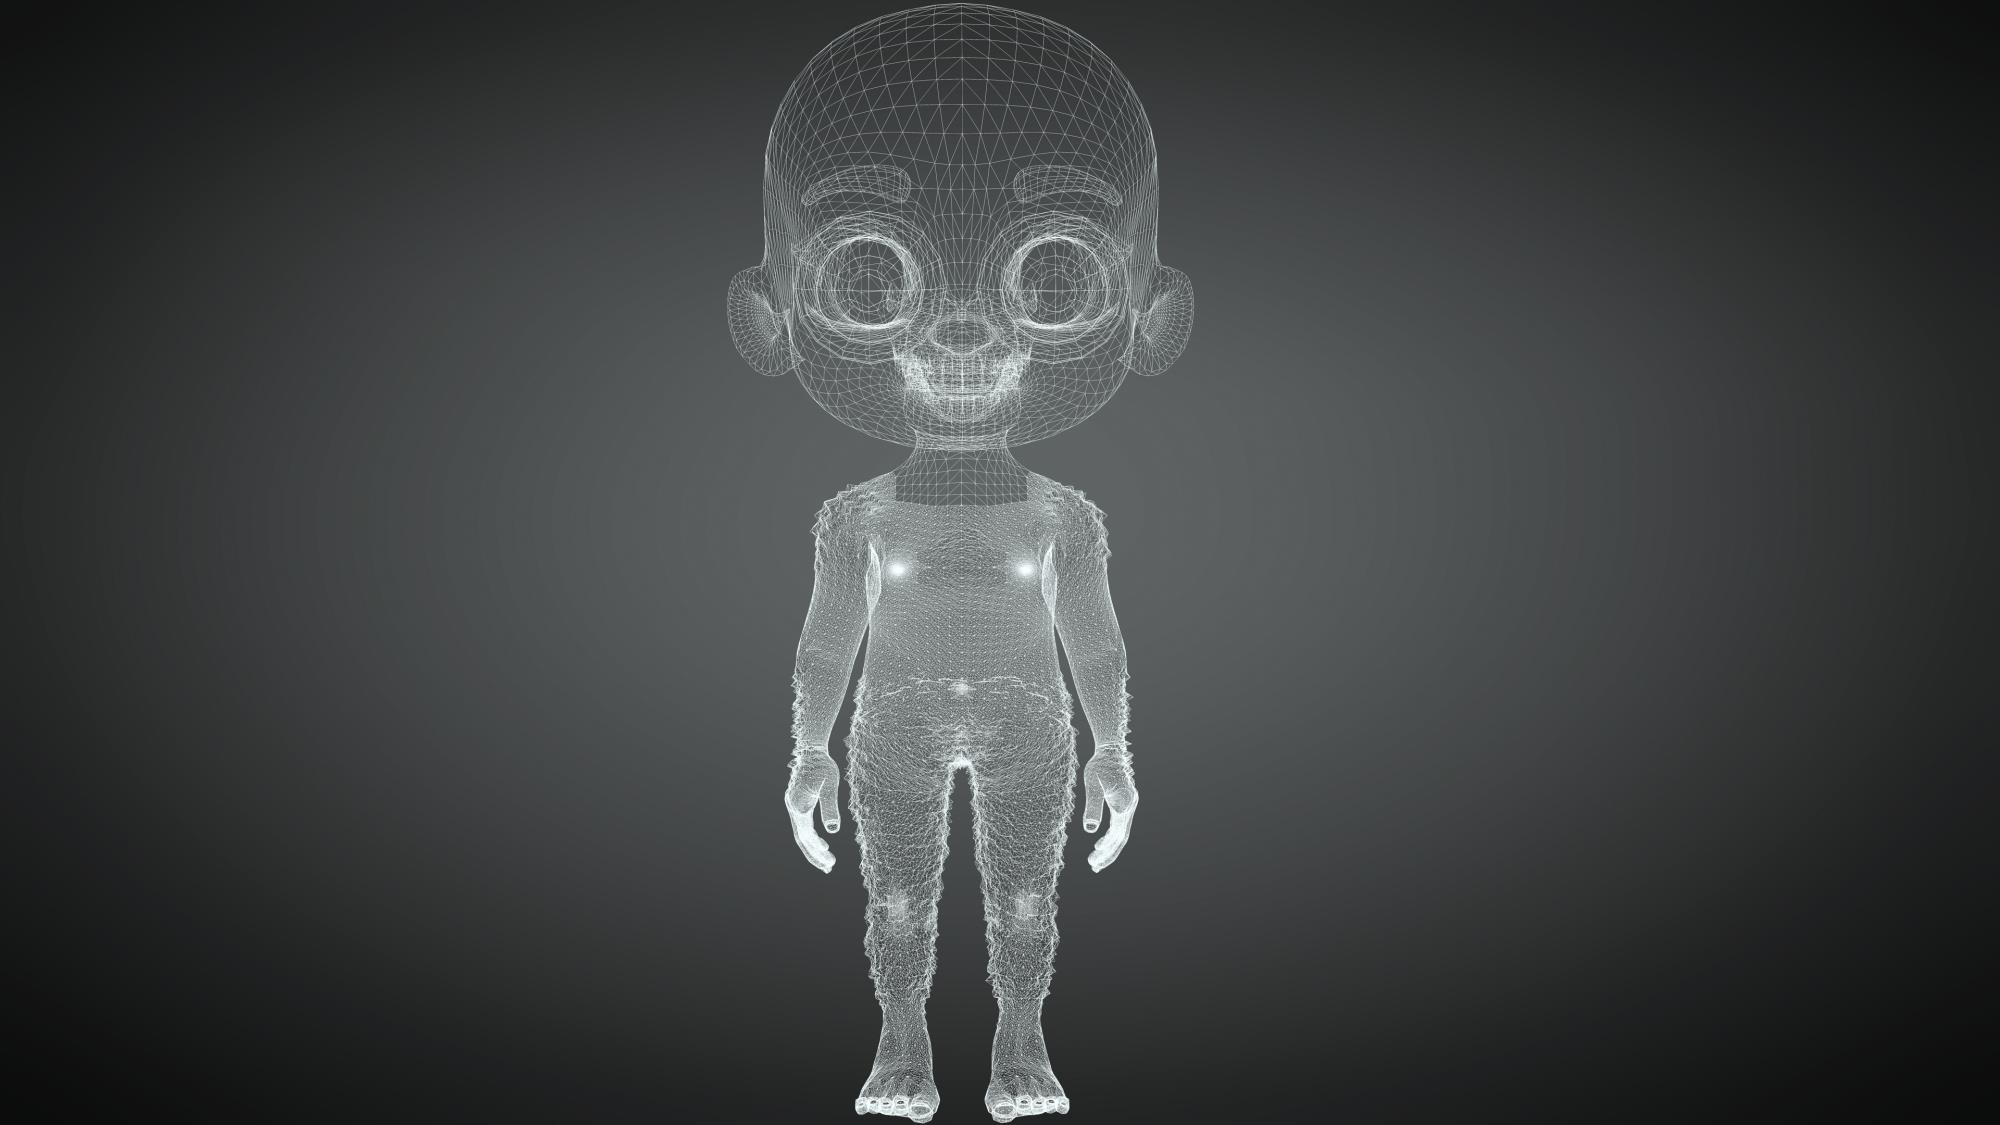 https://forum.reallusion.com/uploads/images/9f64caea-2376-4403-8479-b6e6.jpg